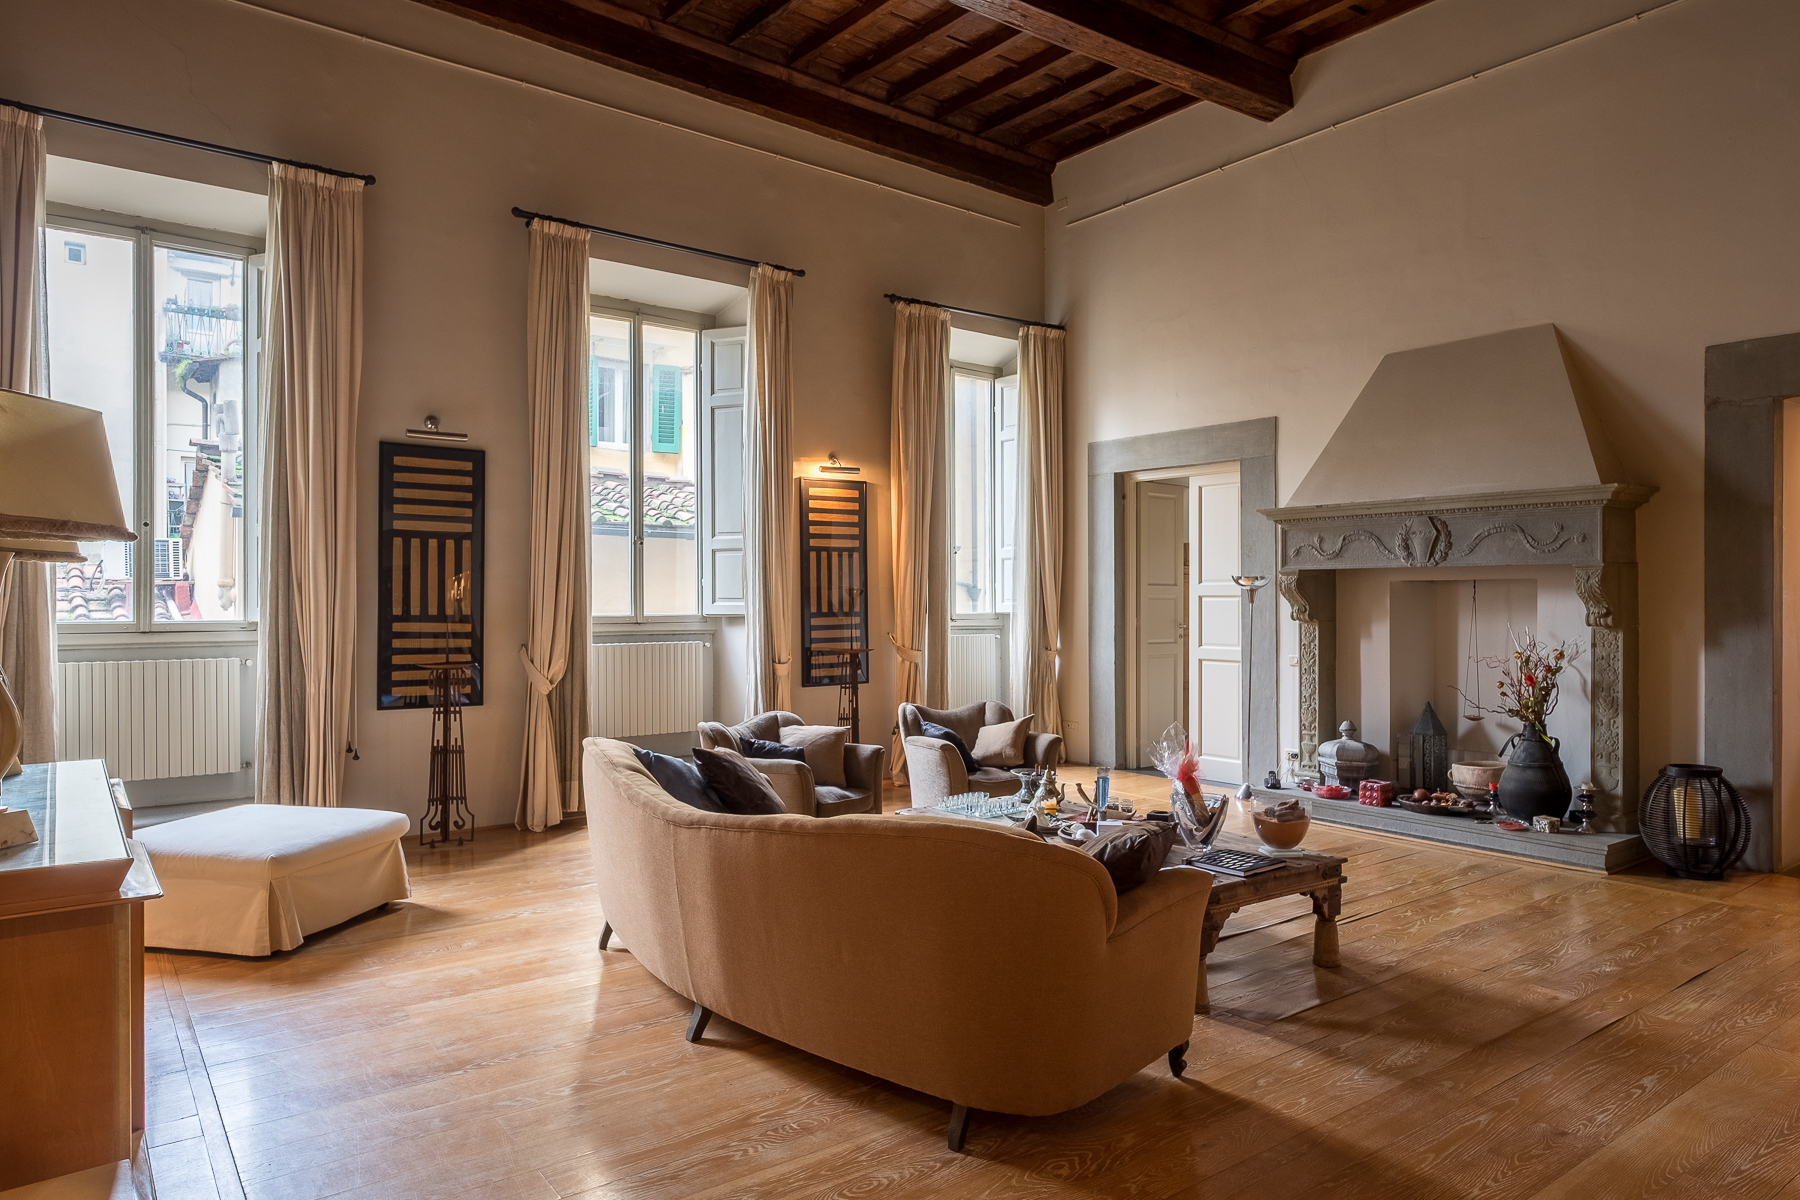 Interni appartamenti di lusso hv91 regardsdefemmes for Interni lusso